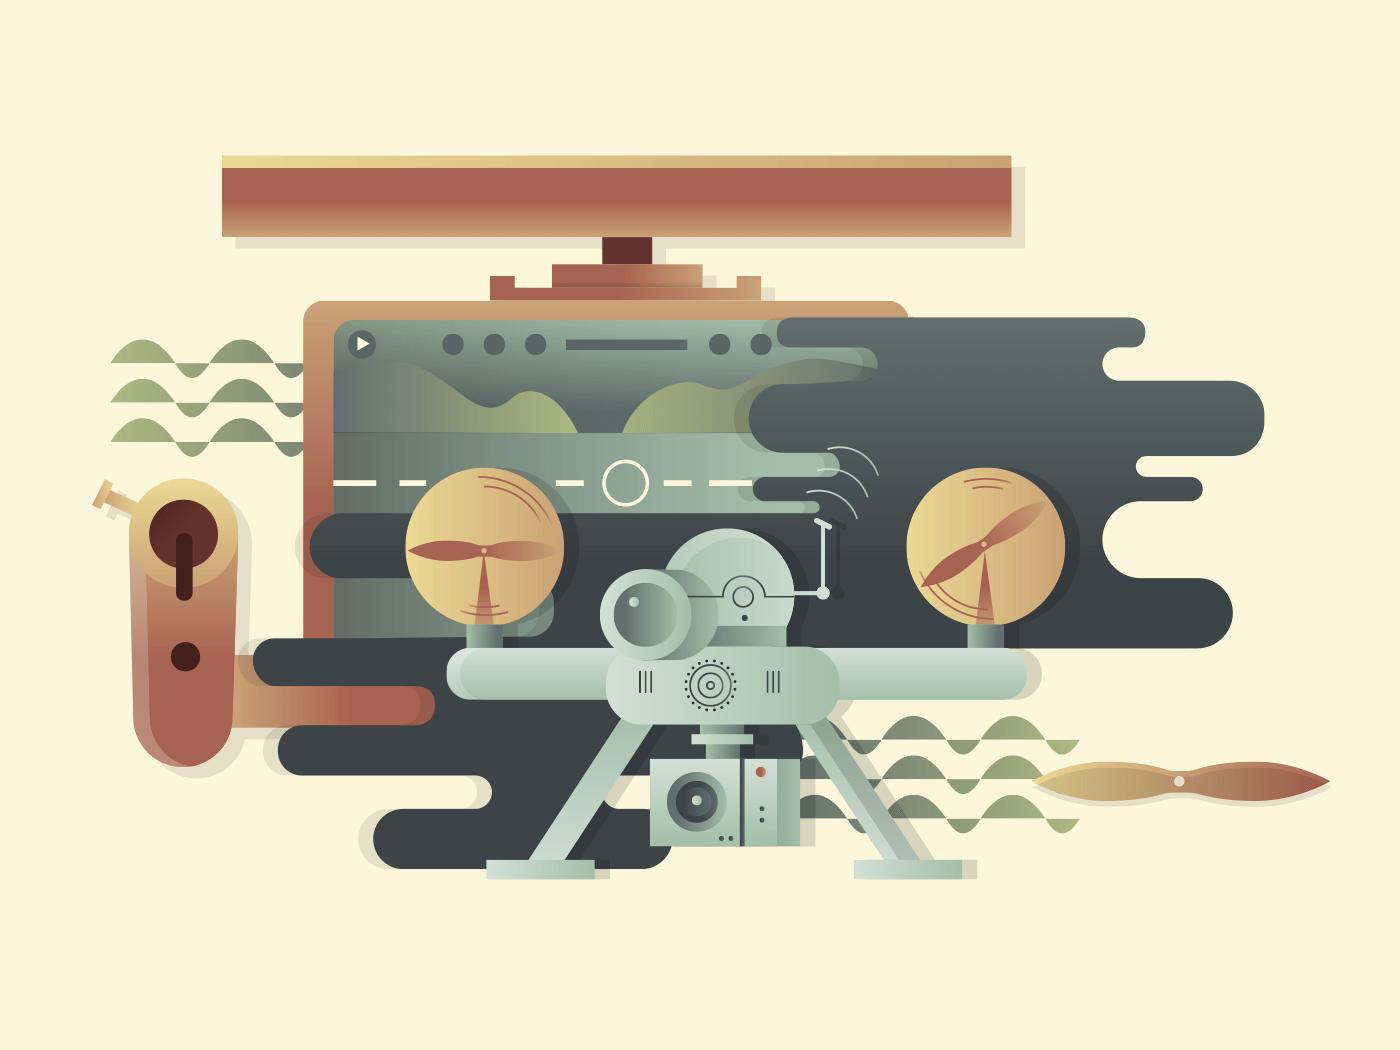 Quadrocopters illustration